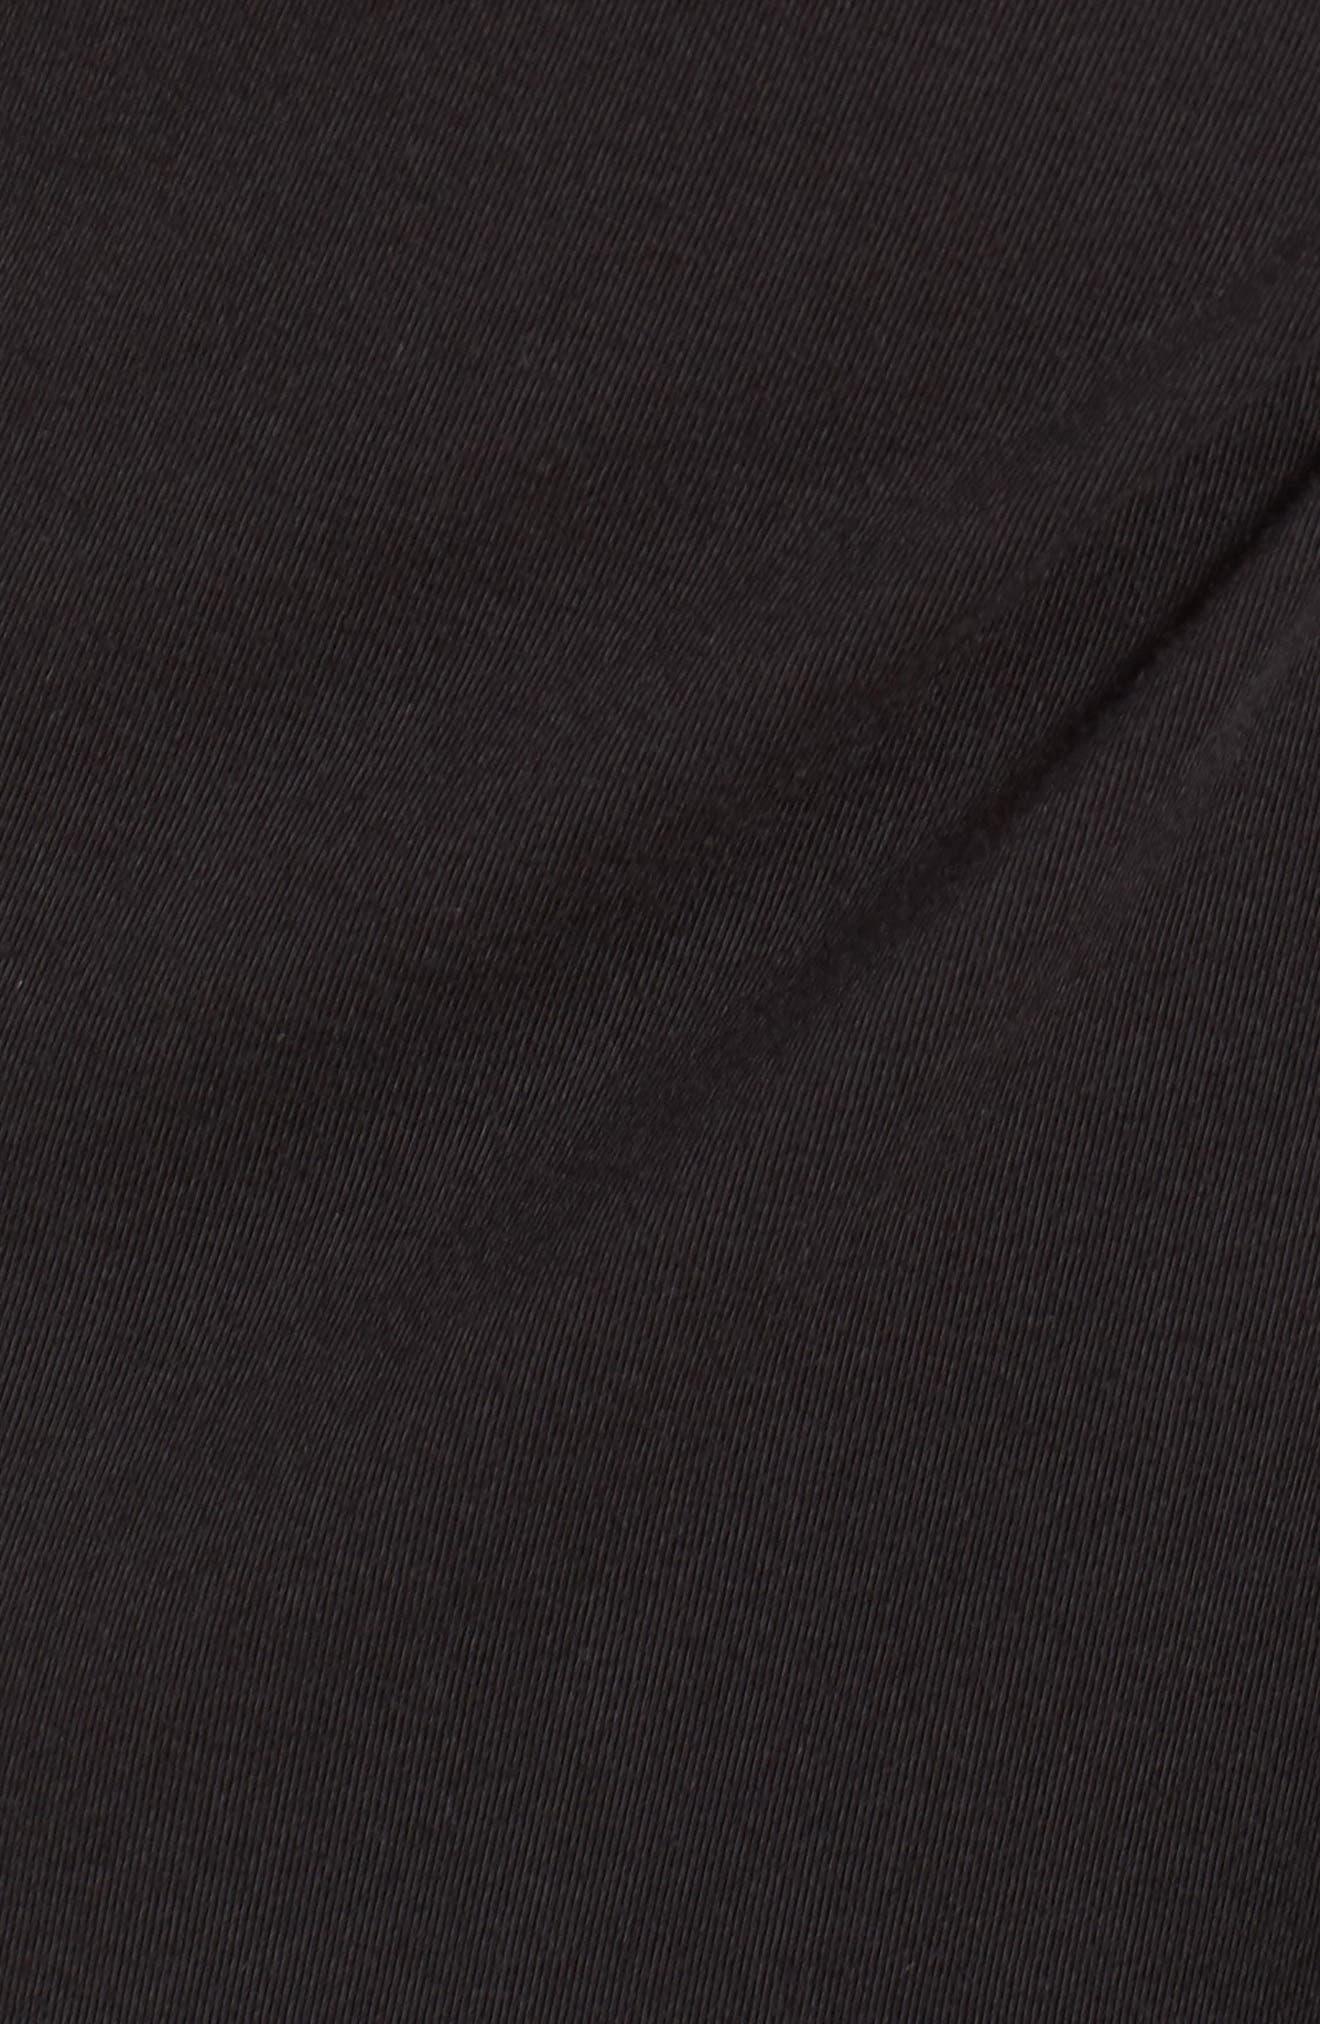 Knot Front T-Shirt Dress,                             Alternate thumbnail 5, color,                             004